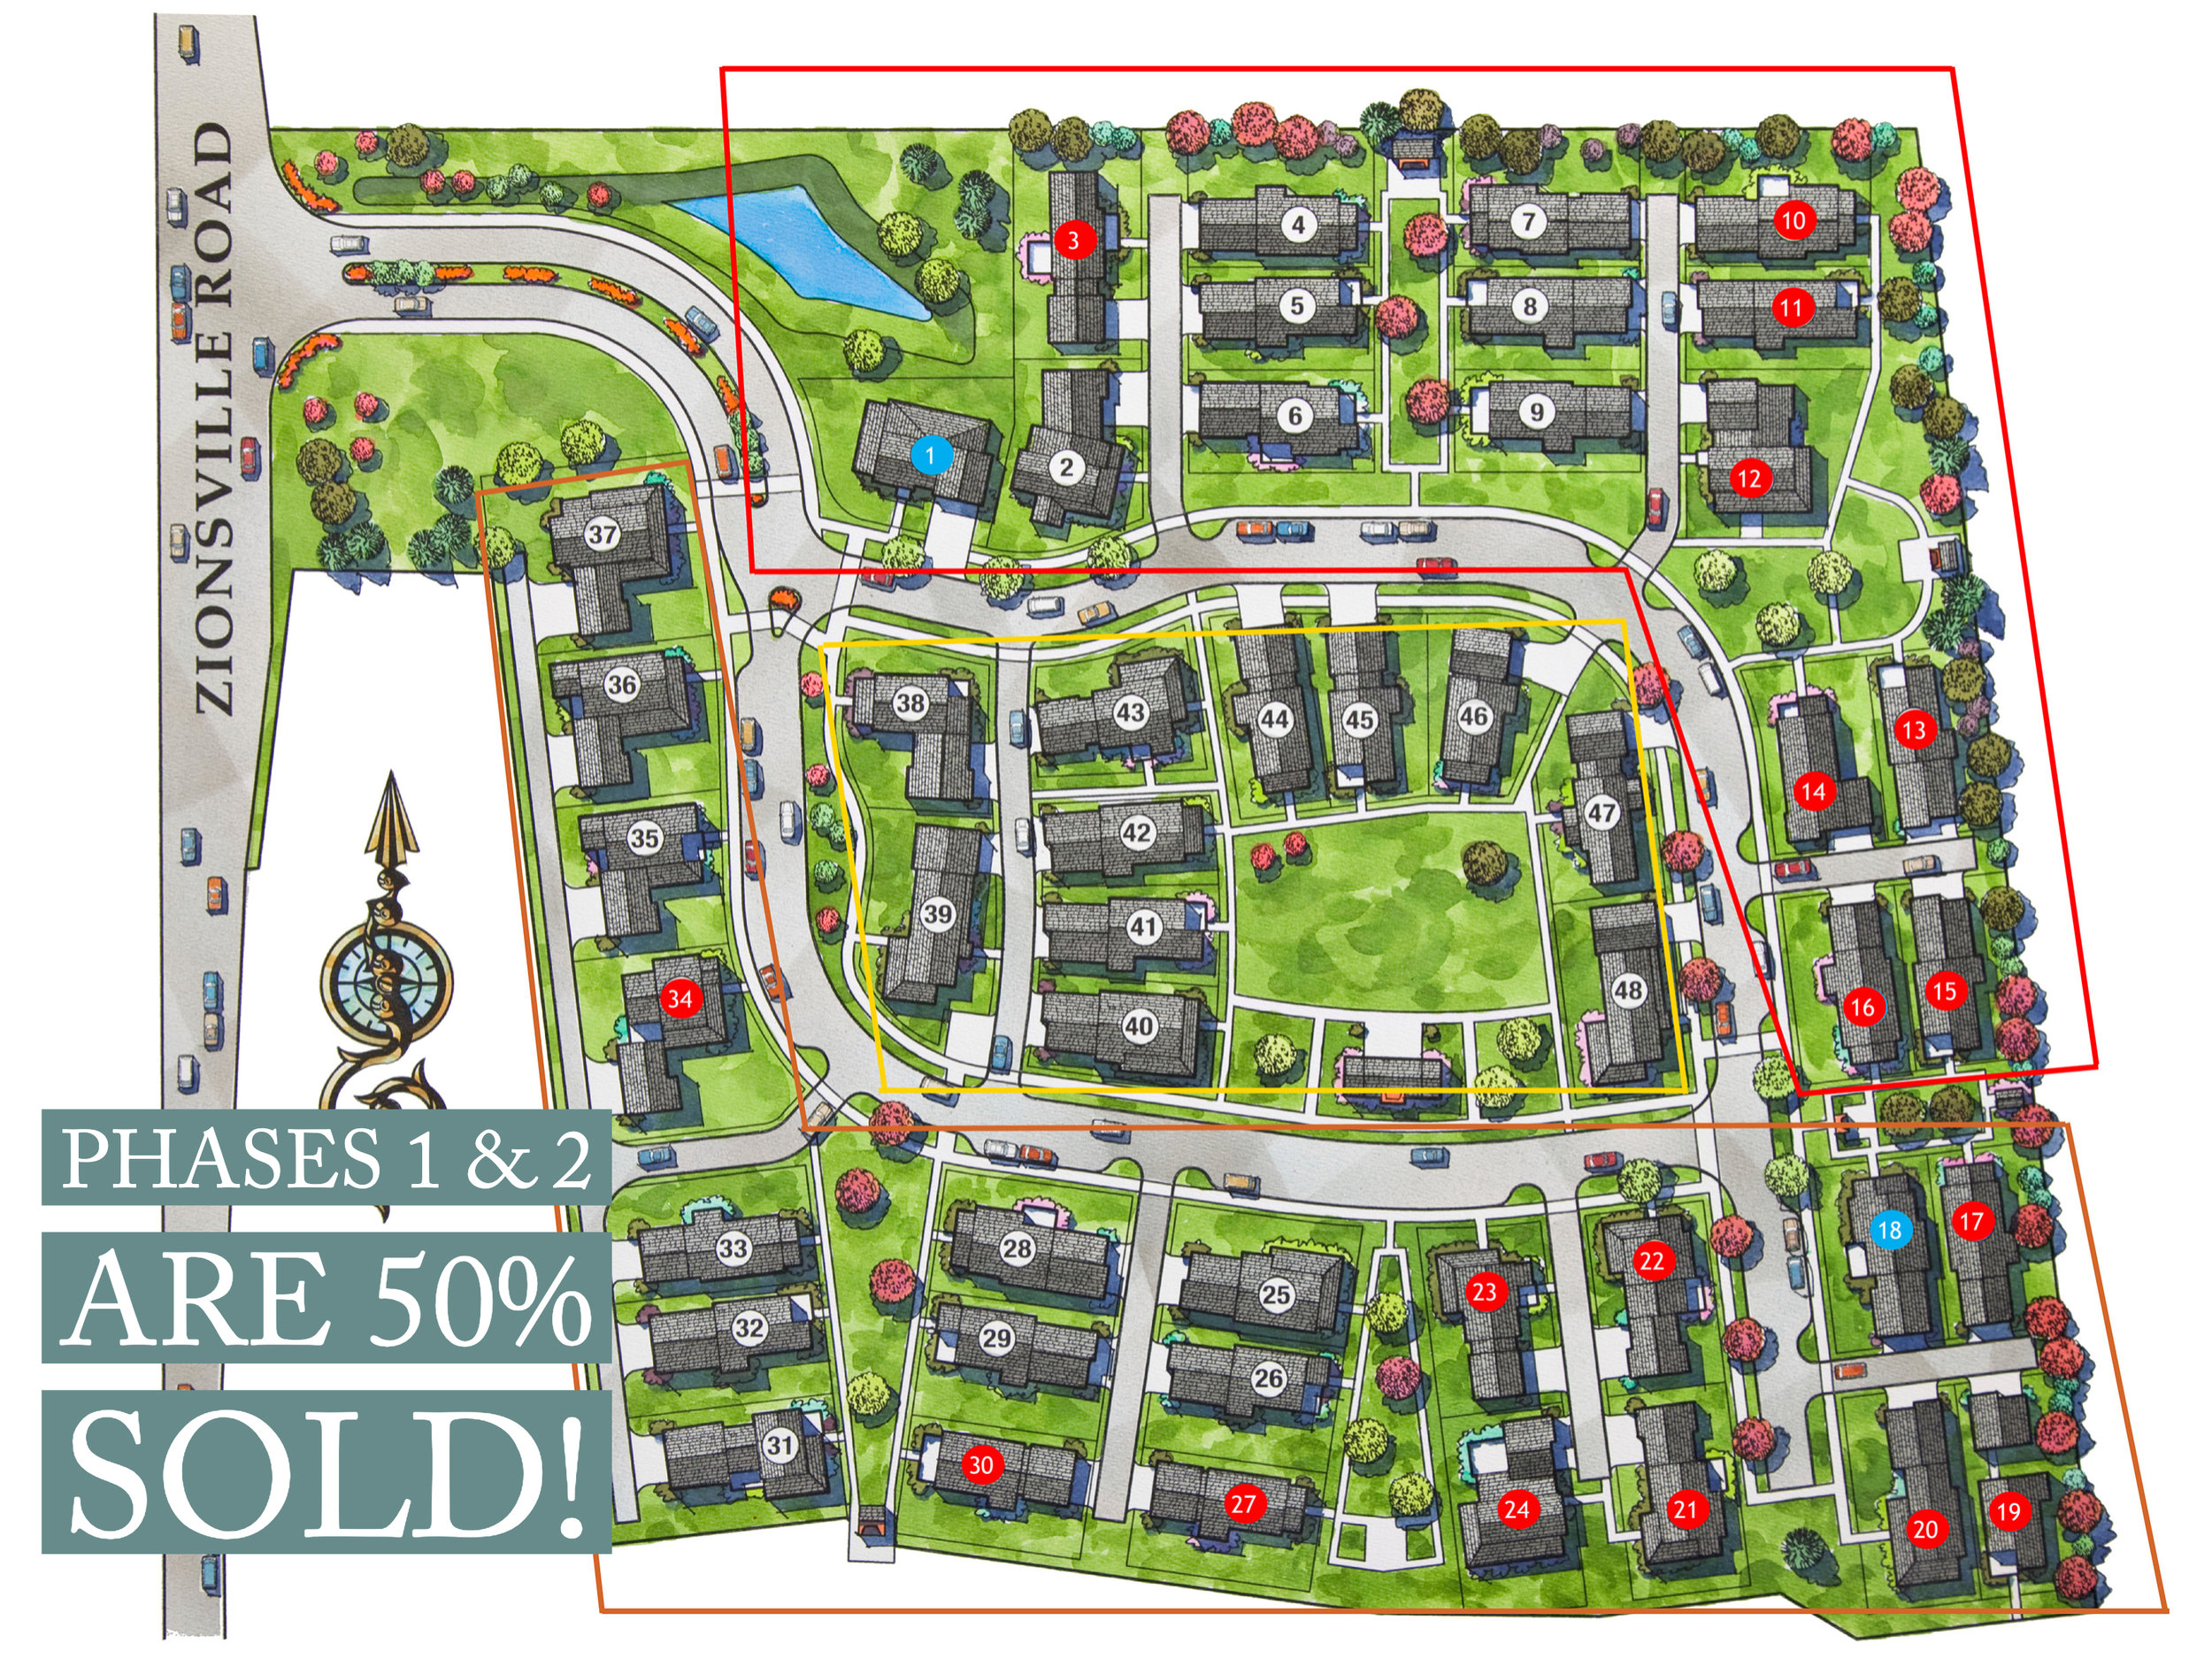 Inglenook of Zionsville Pocket Neighborhood Plan